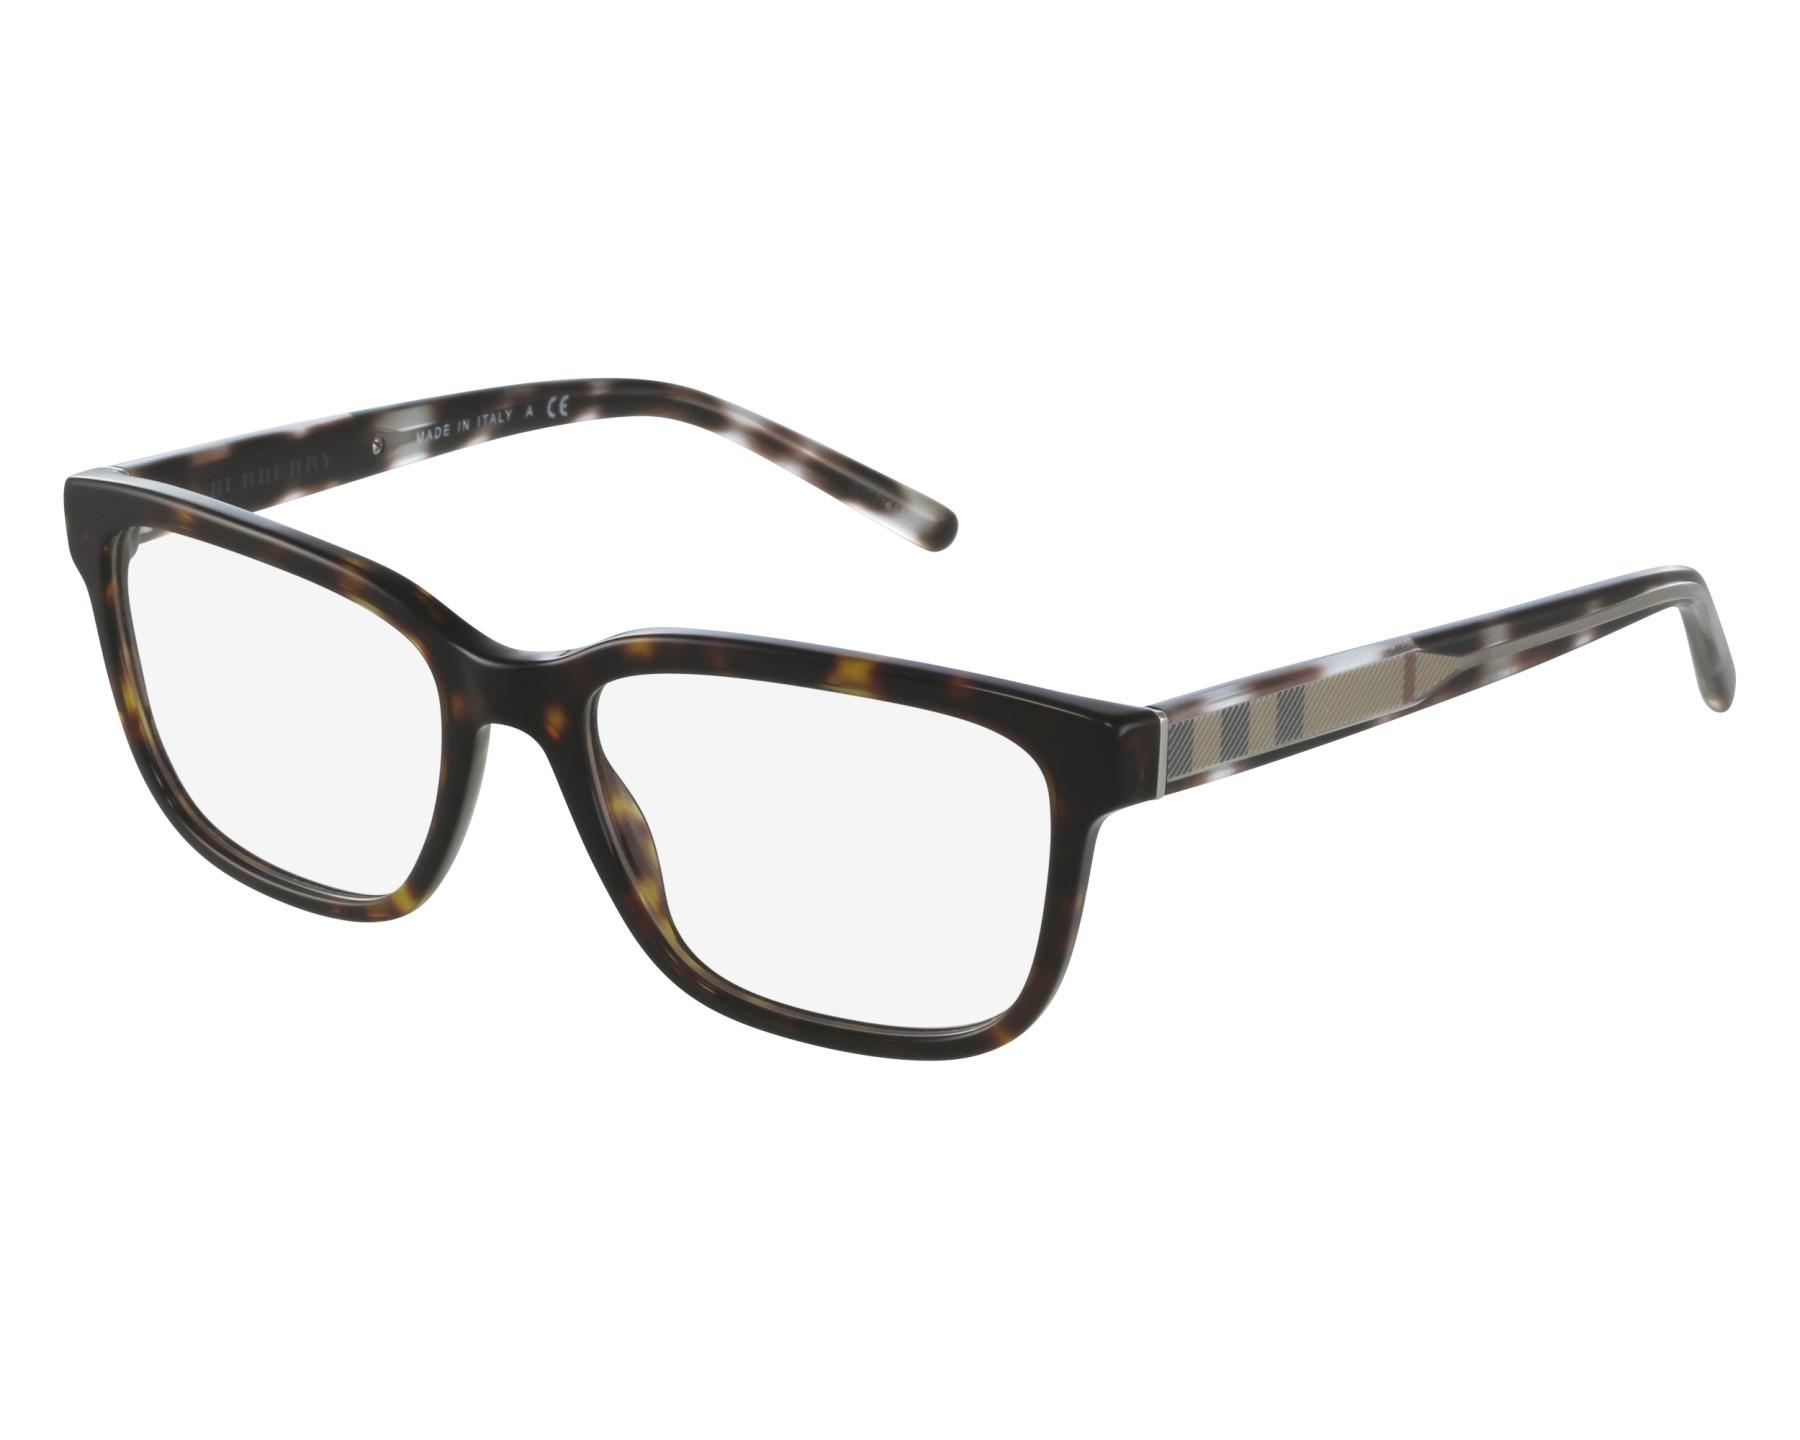 5b59f973406 eyeglasses Burberry BE-2230 3002 - Havana Beige front view